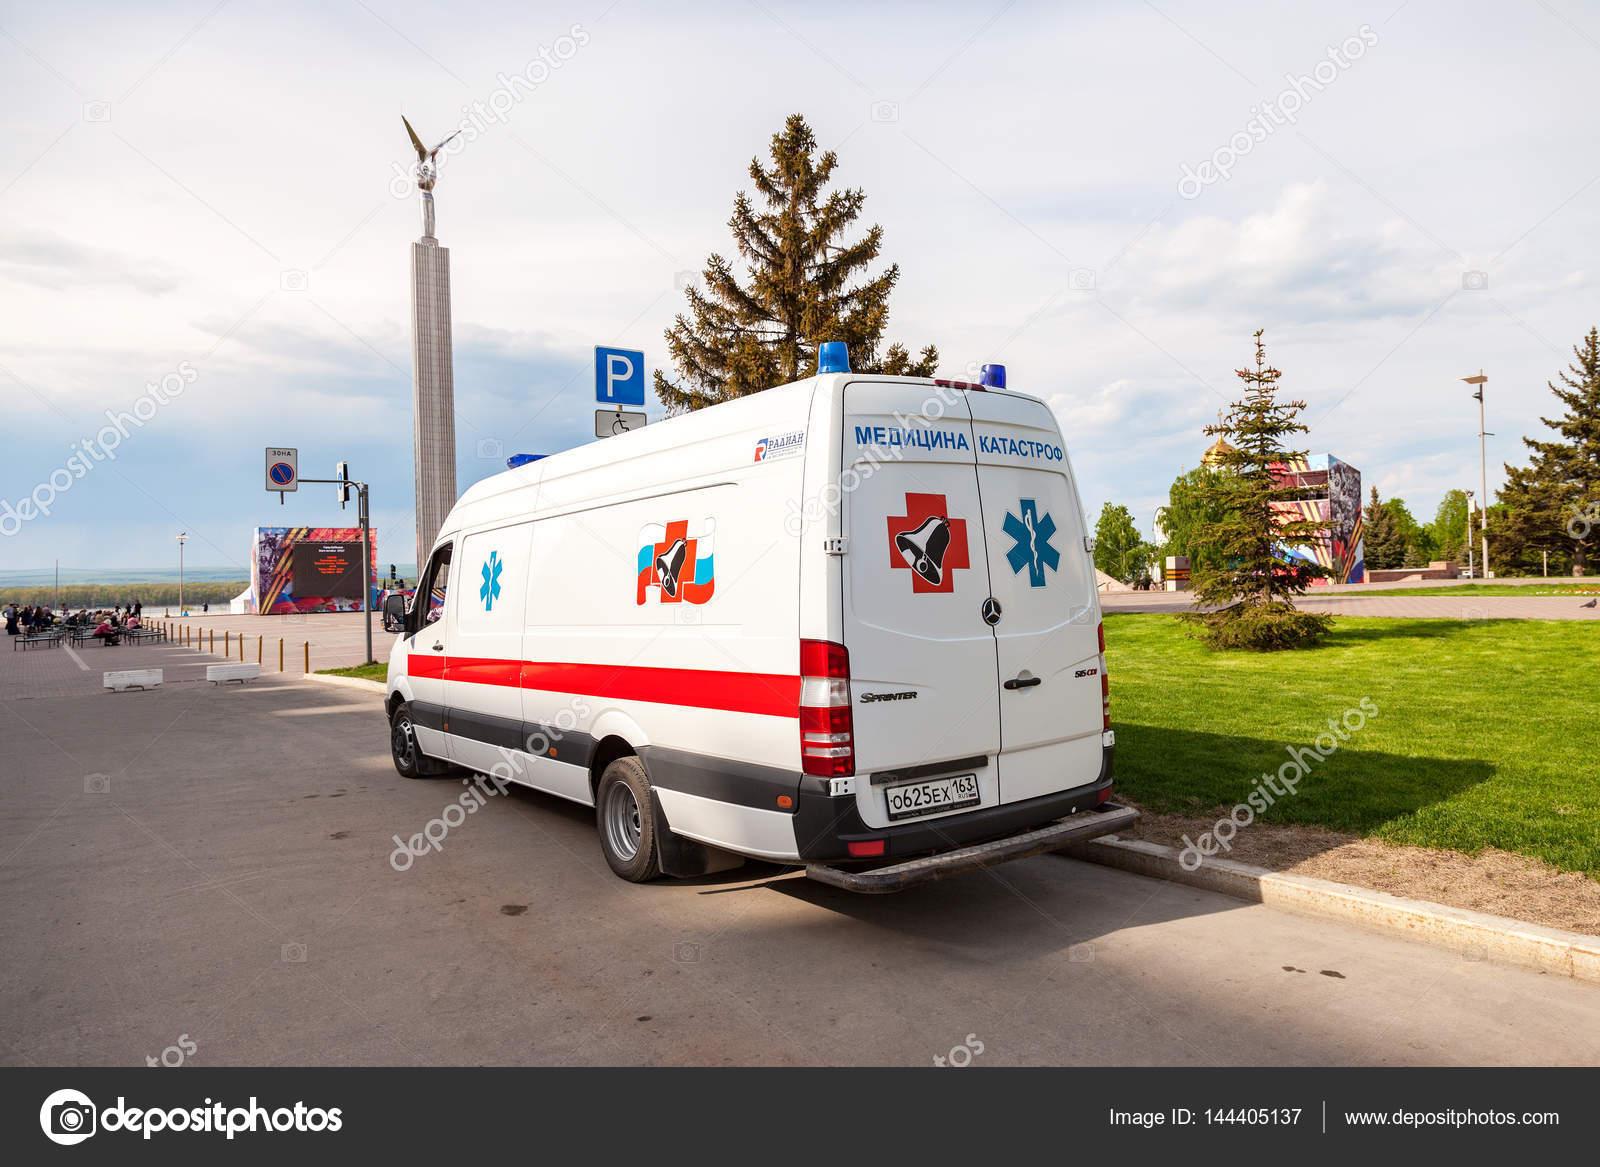 Bilaffar pa ryska